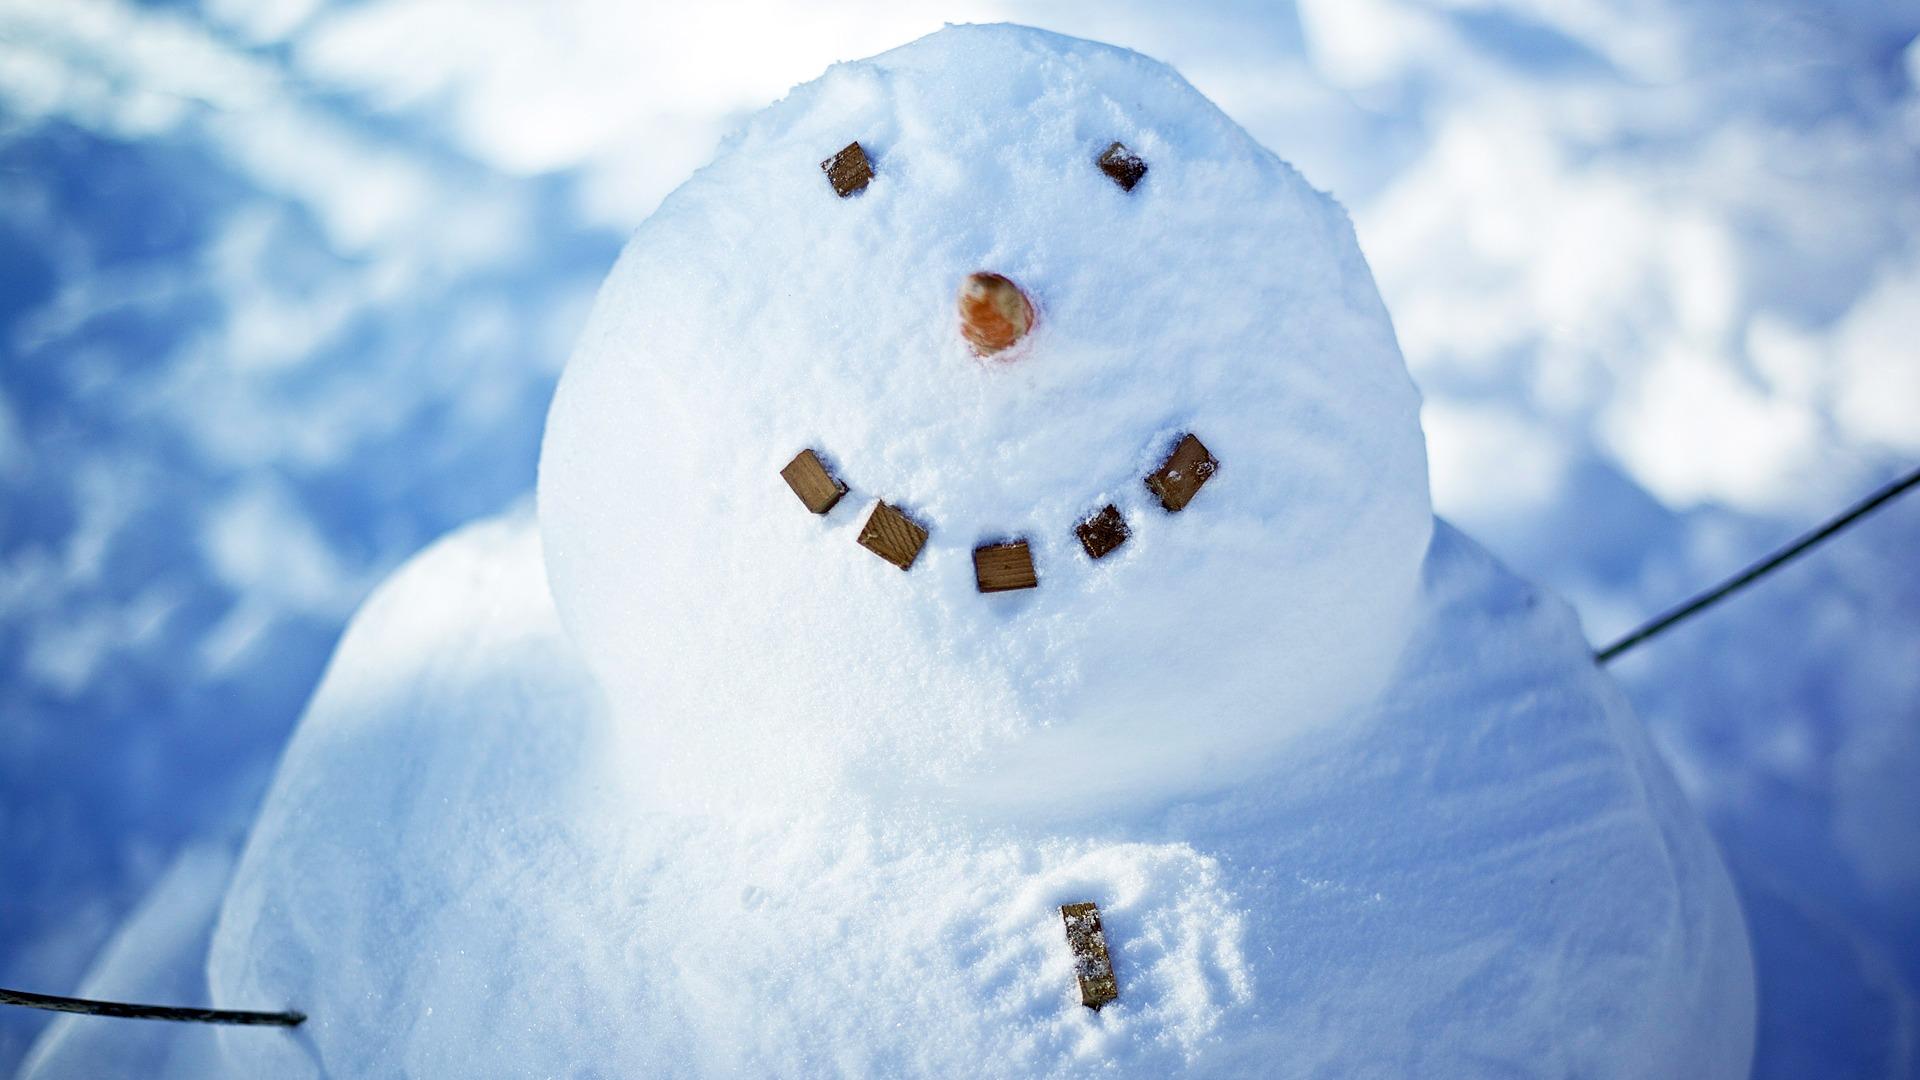 Aesthetic Cute Snowman Christmas Hd Computer Wallpaper 21